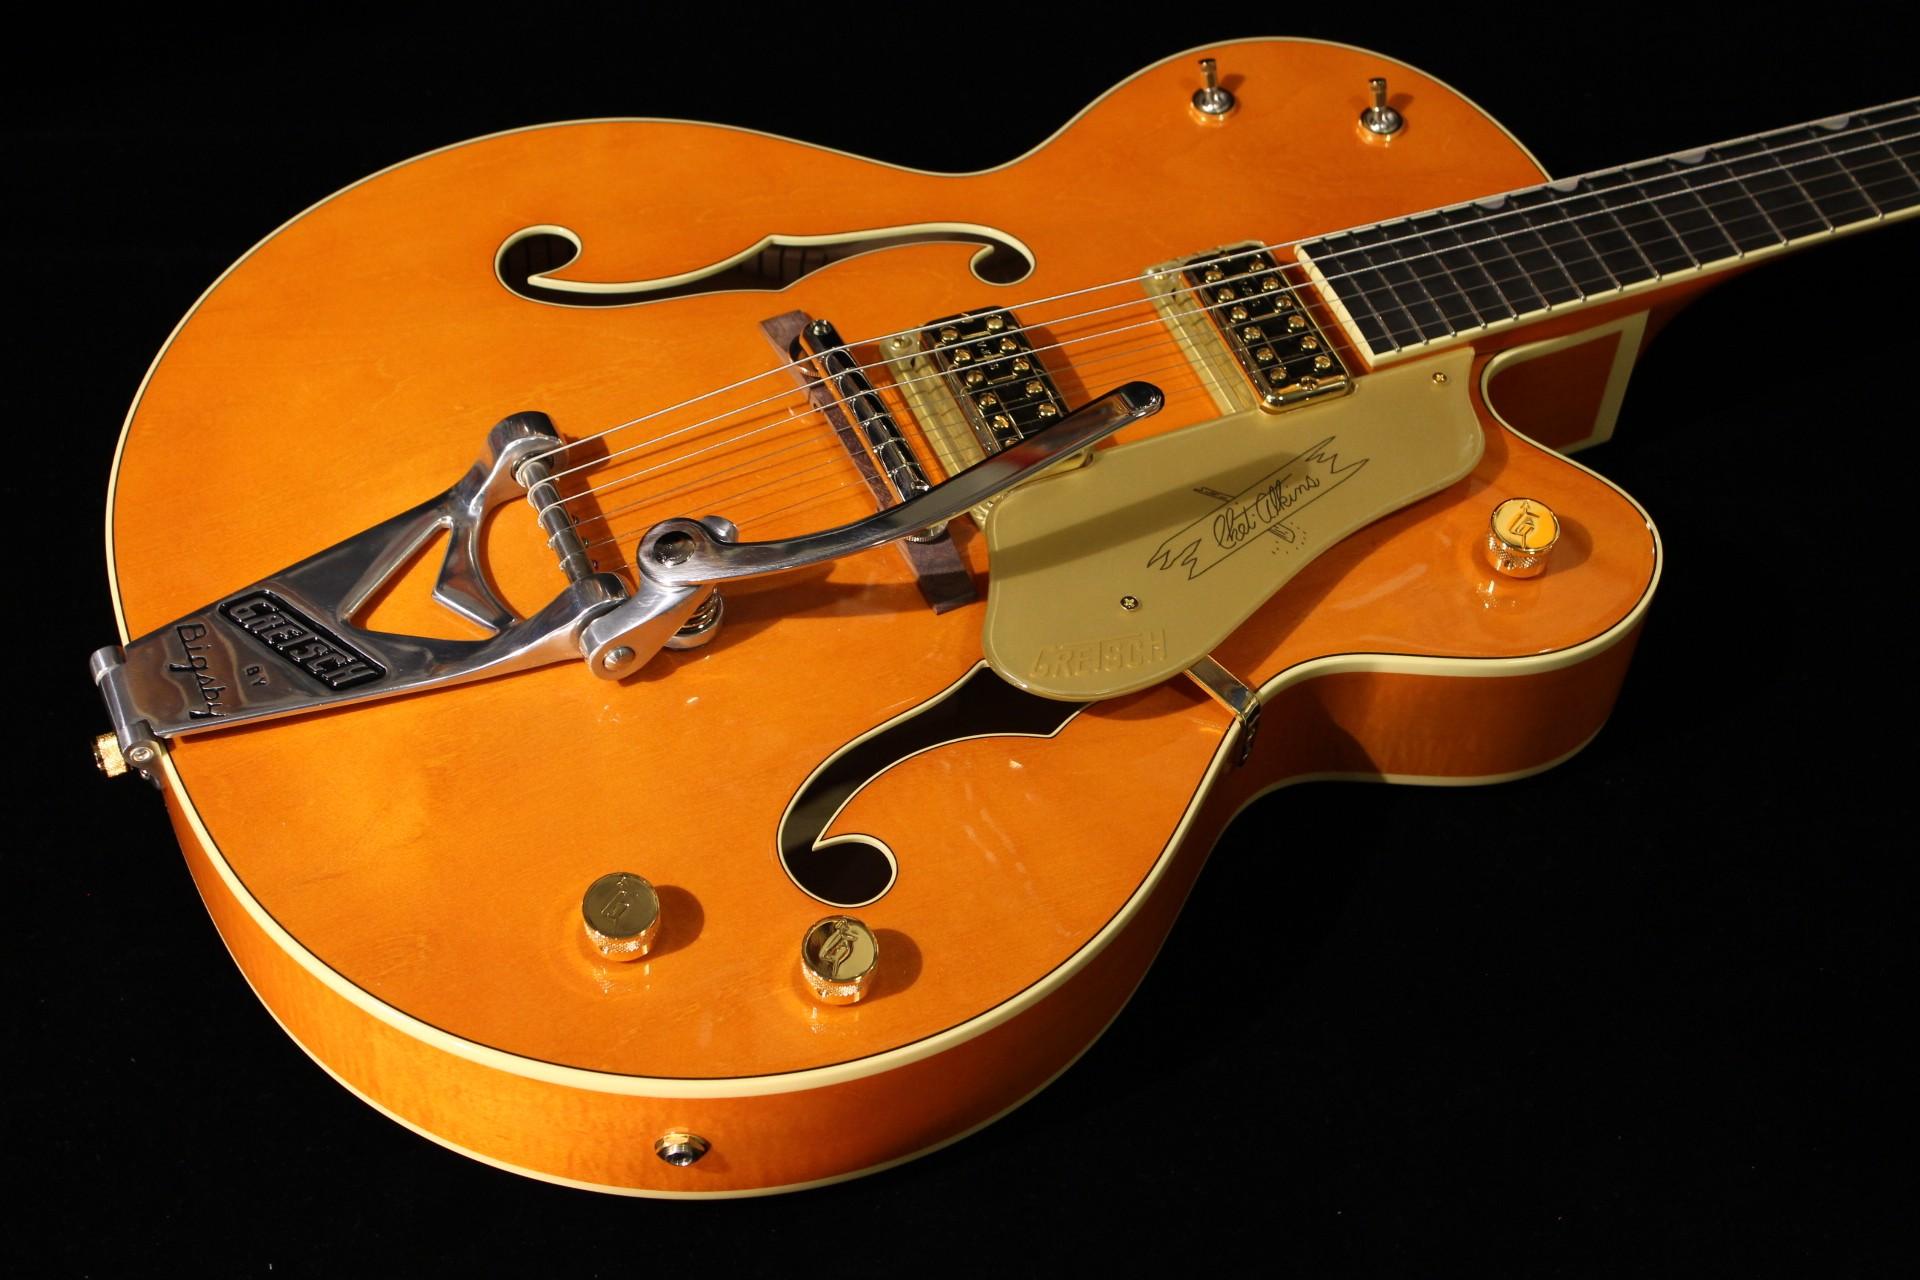 gretsch g6120 1959ltv chet atkins orange lacquer gino guitars. Black Bedroom Furniture Sets. Home Design Ideas